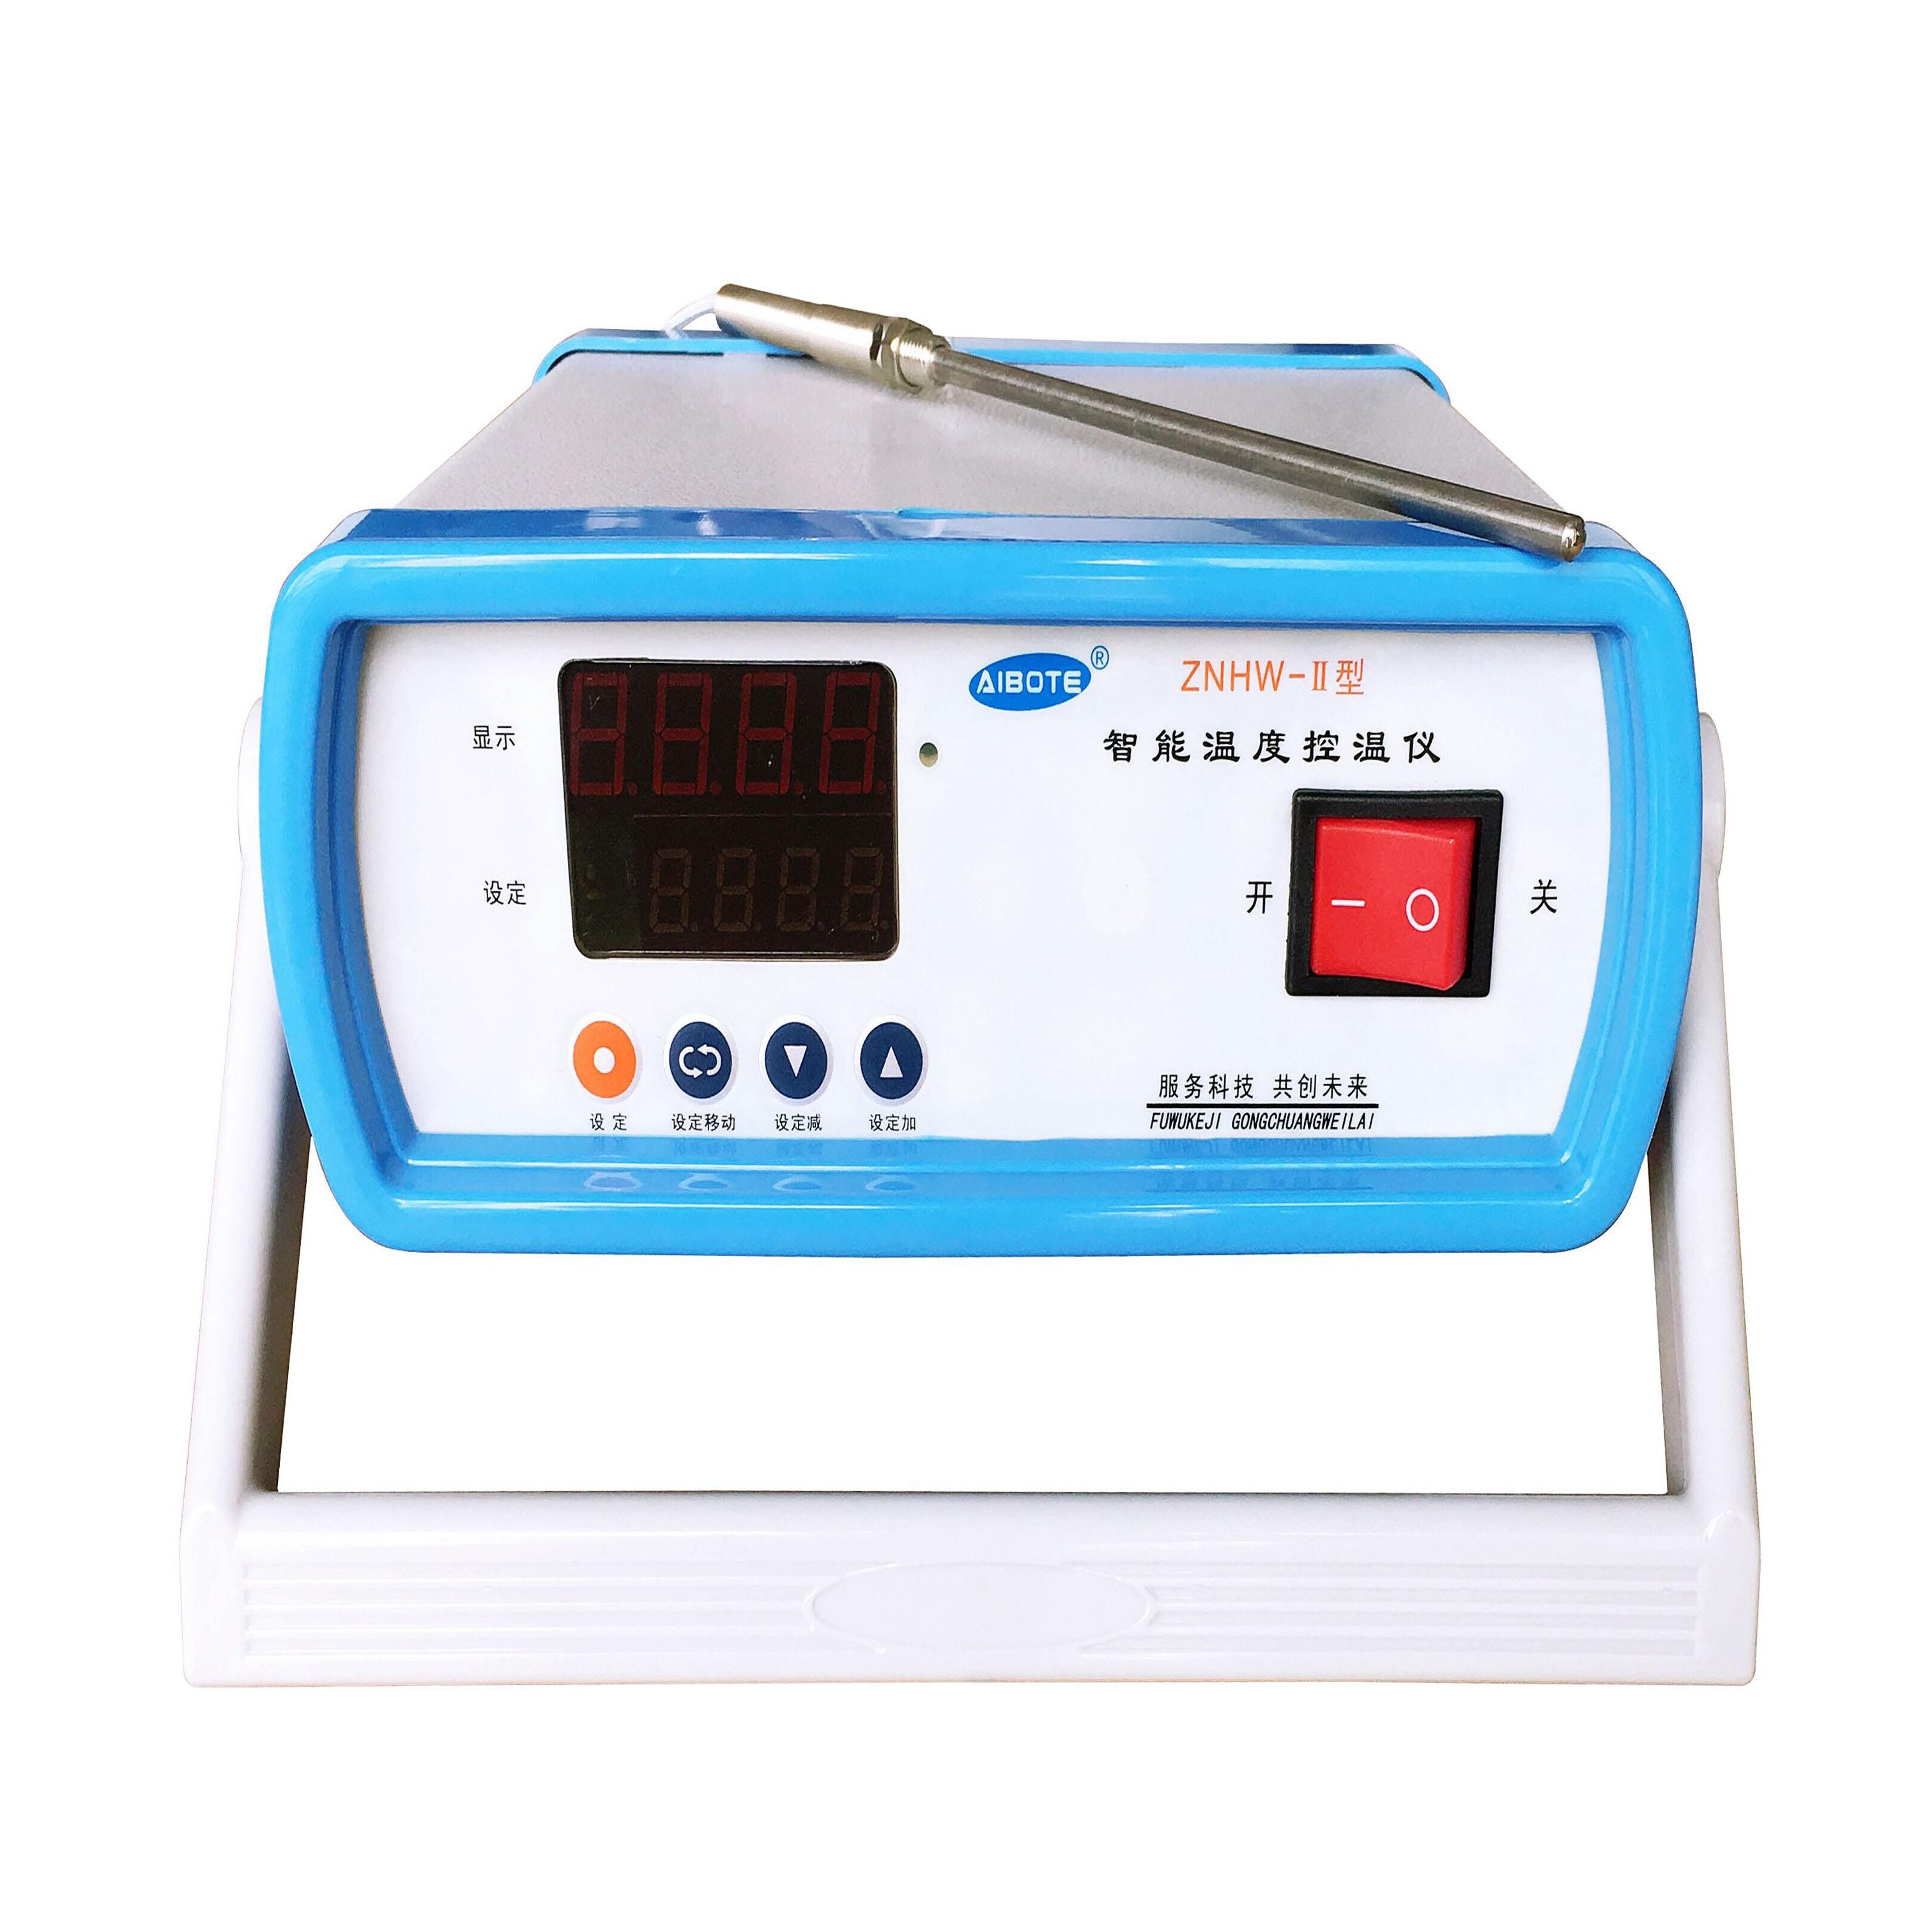 ZNHW-II型 智能温度控制仪